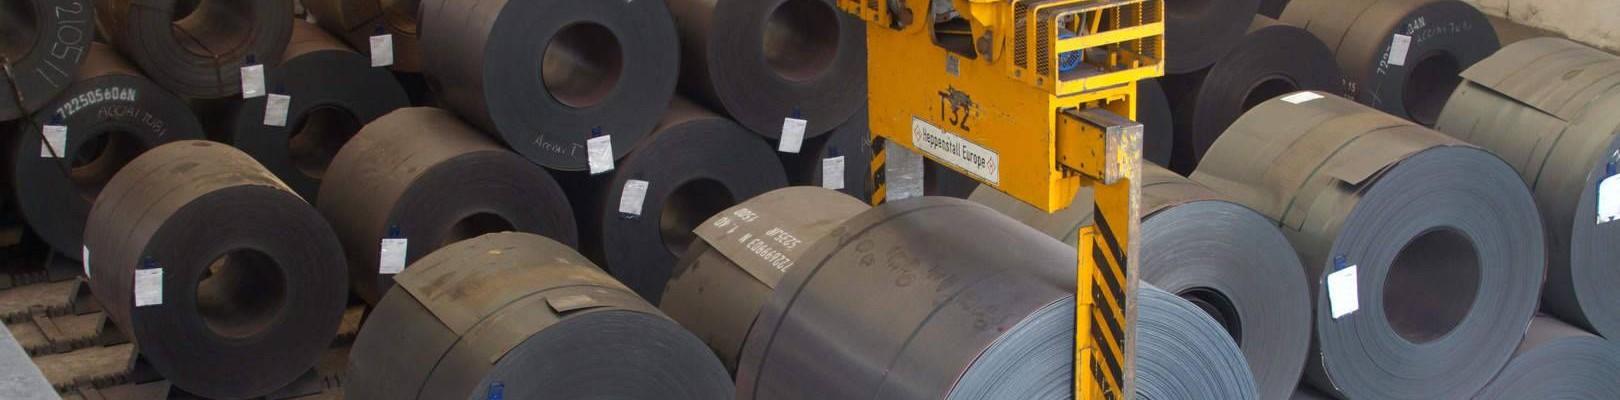 Coils at the Acciaitubi production facility